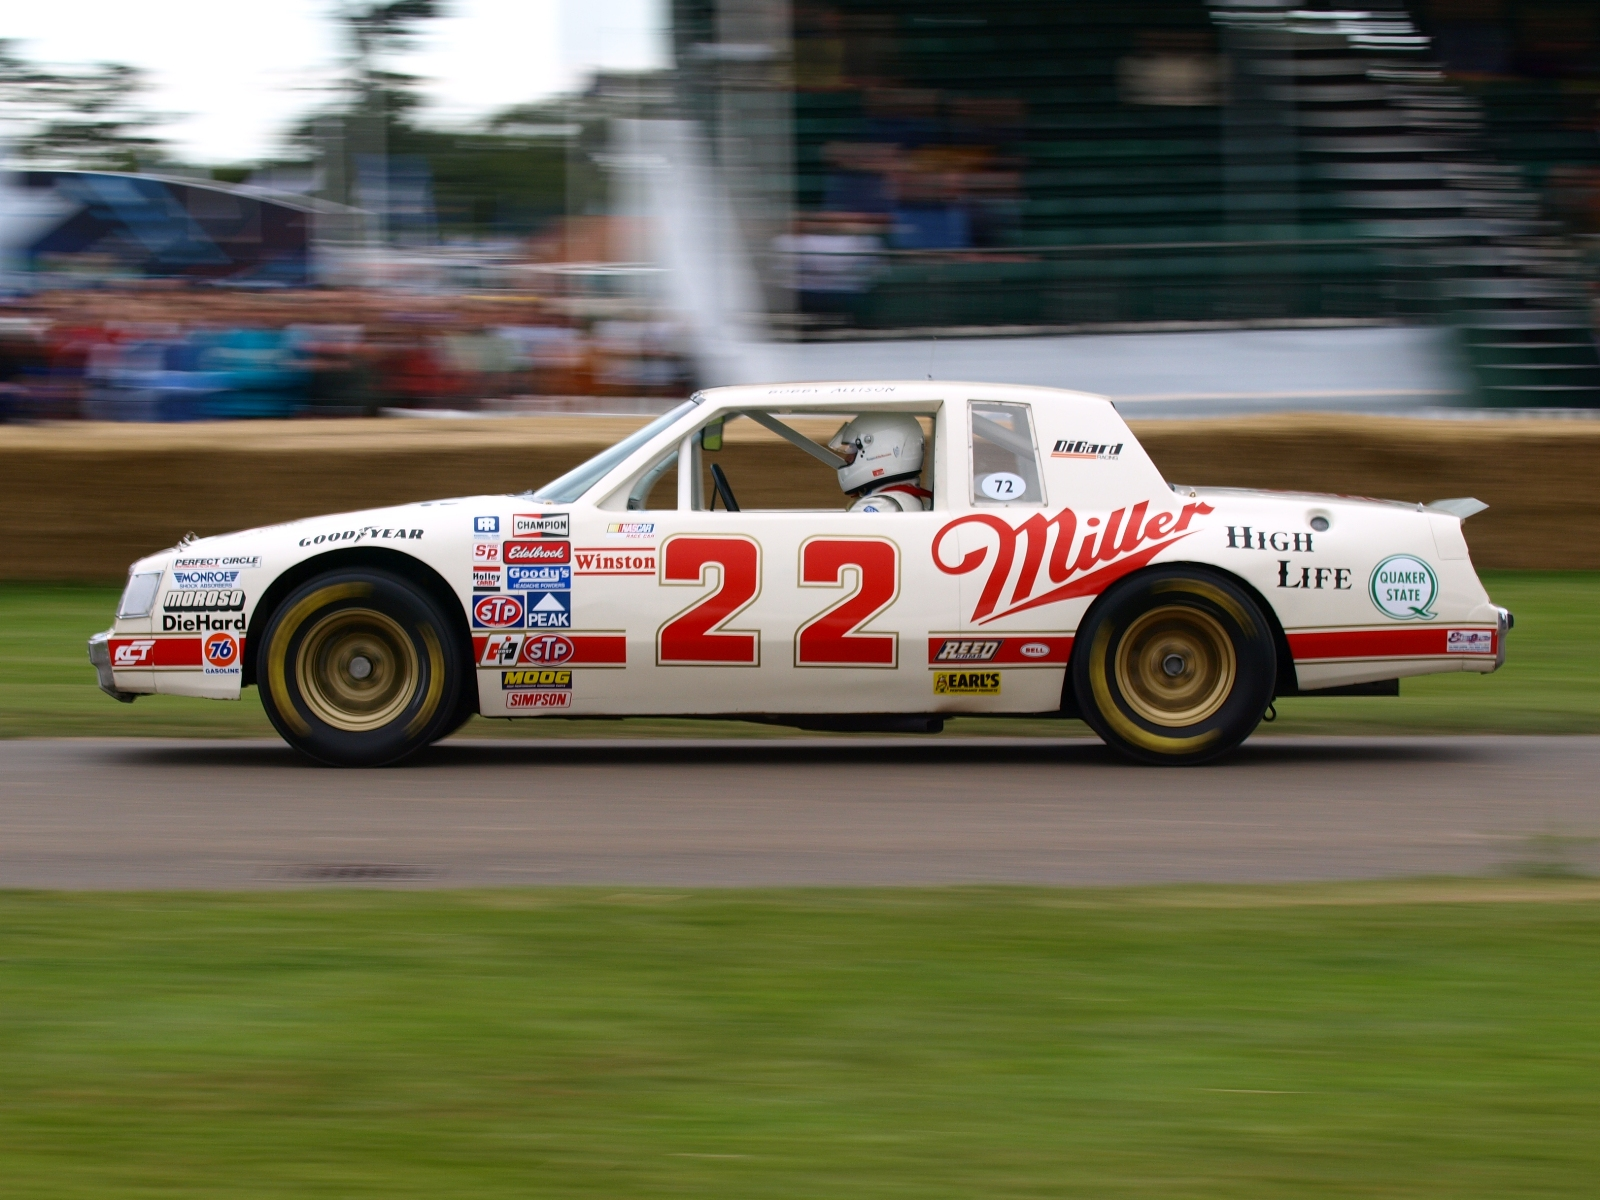 Race Car Nascar Erndhart Jr